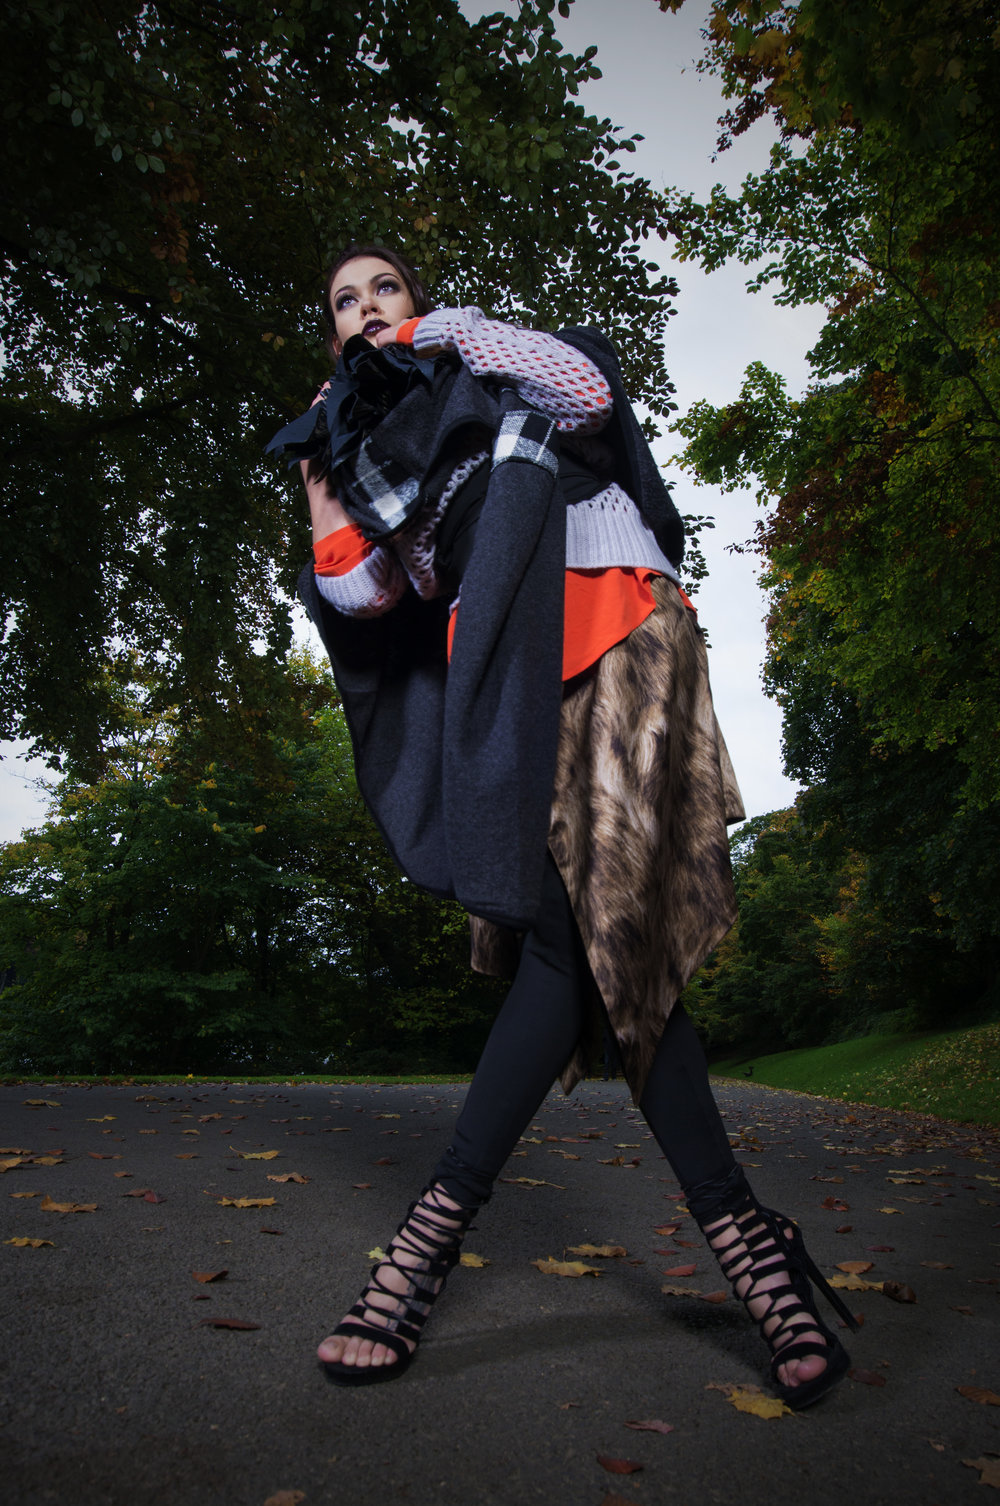 zaramia-ava-zaramiaava-leeds-fashion-designer-ethical-sustainable-tailored-minimalist-jacket-accent-coat-jacket-print-shirt-top-versatile-drape-cowl-styling-shop-womenswear-models-photoshoot-colour-2